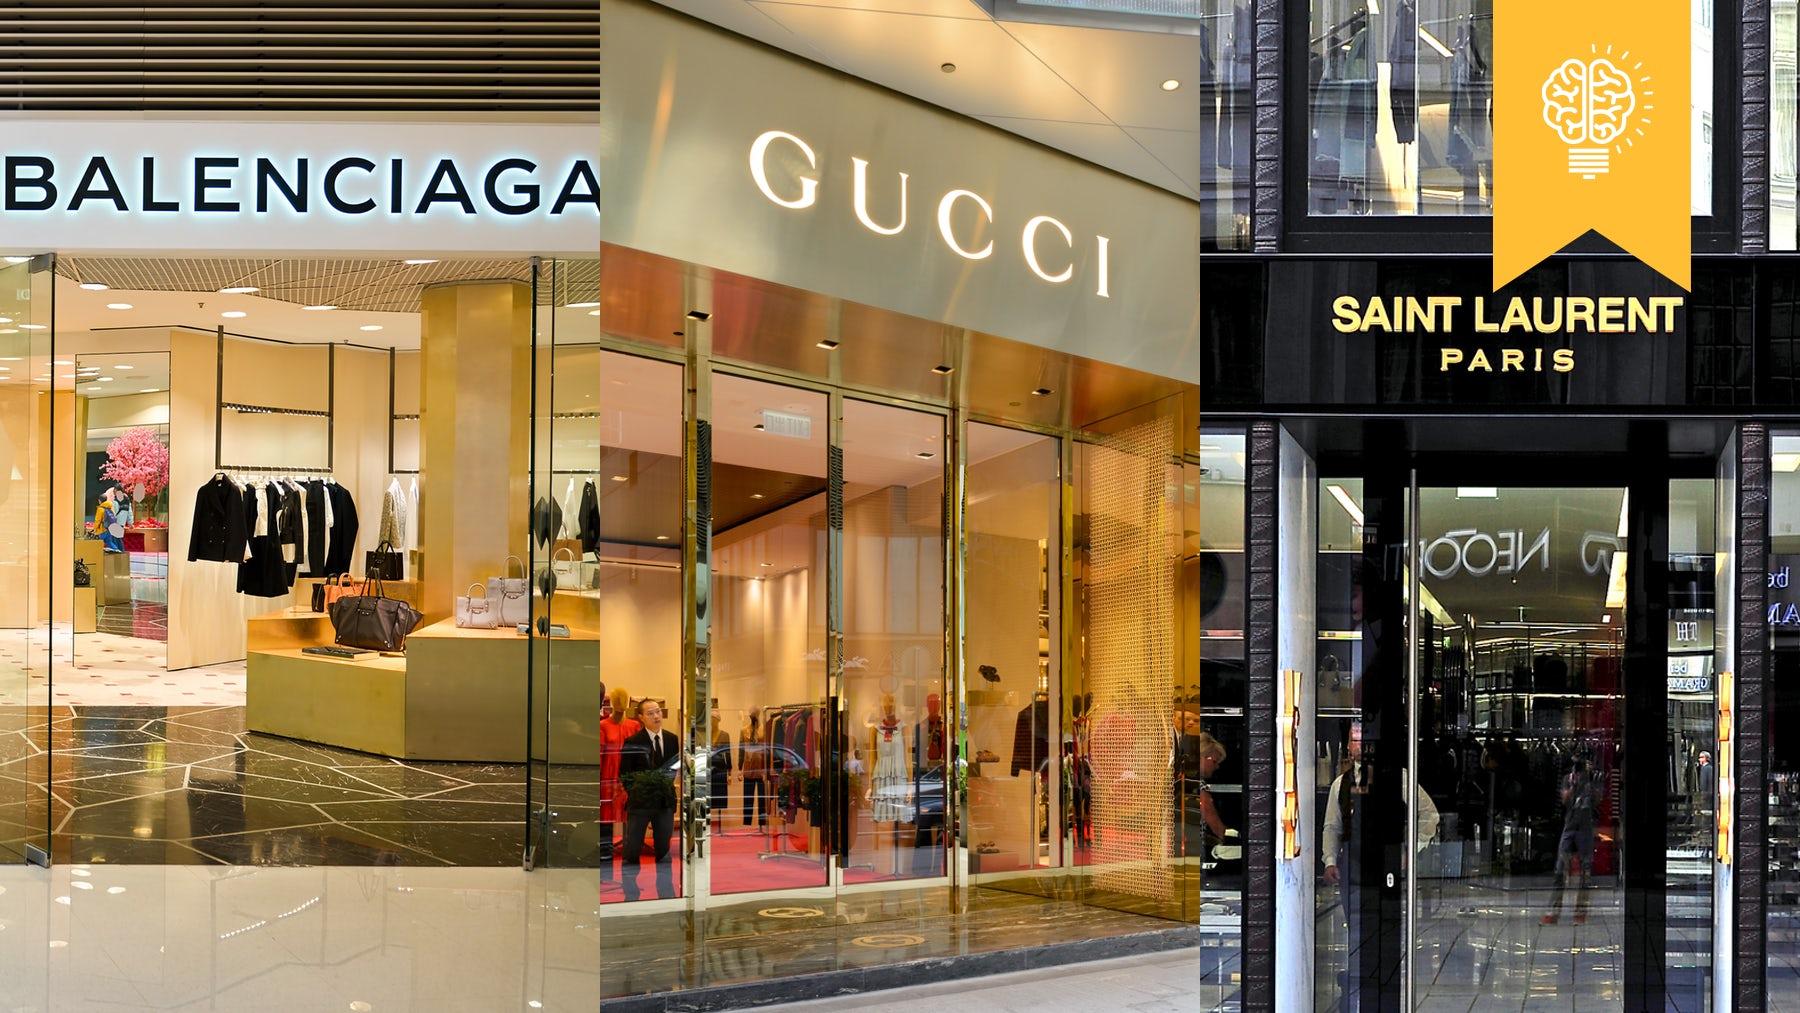 Gucci, Balenciaga and Saint Laurent stores | Source: Shutterstock